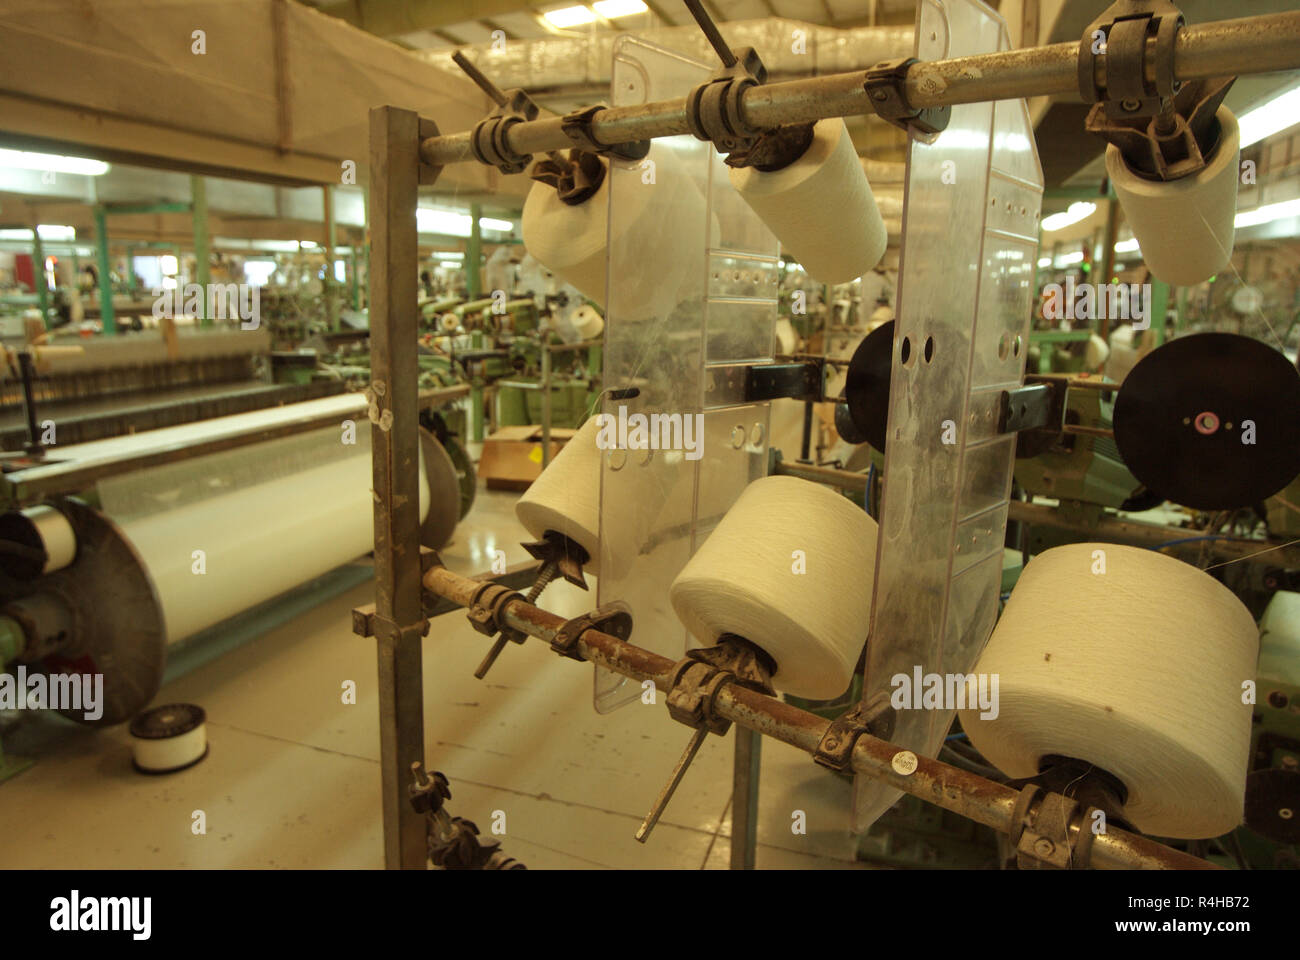 Textile production - Stock Image